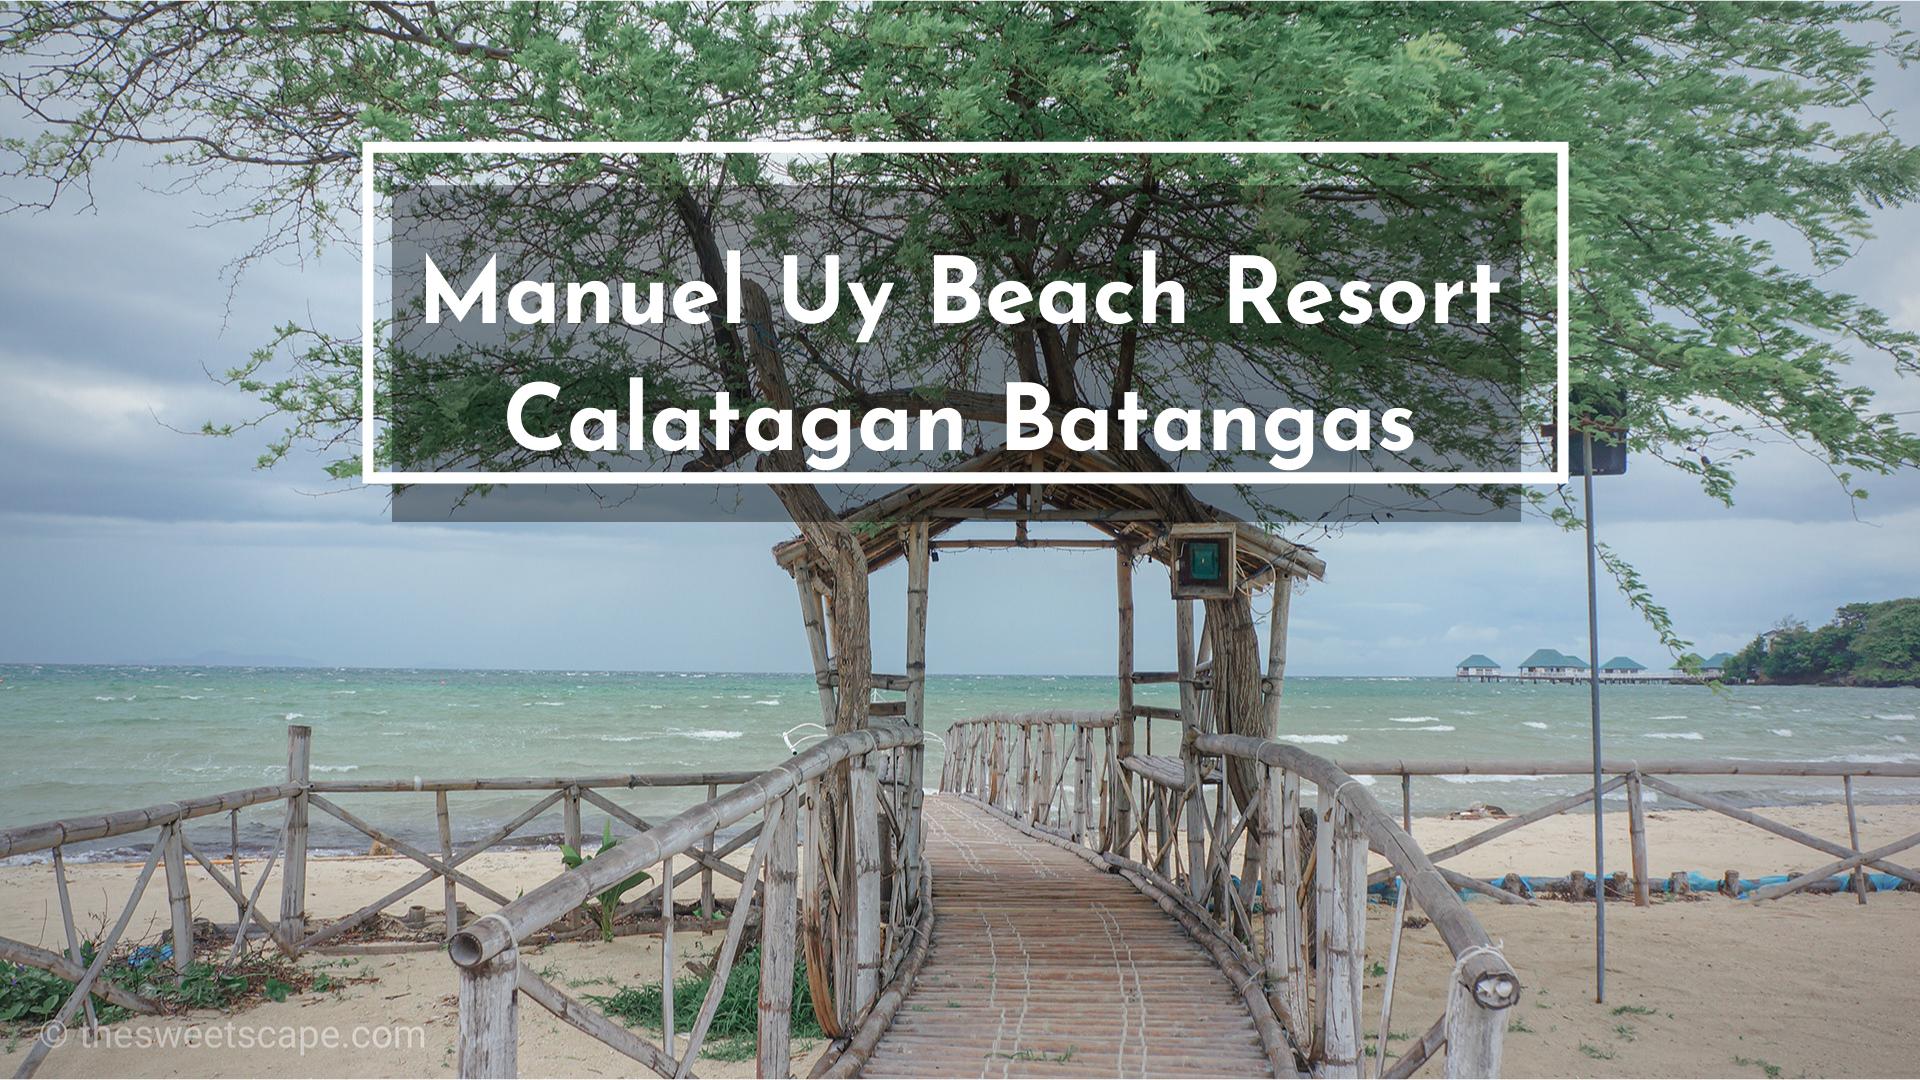 Manuel Uy Beach Resort Calatagan